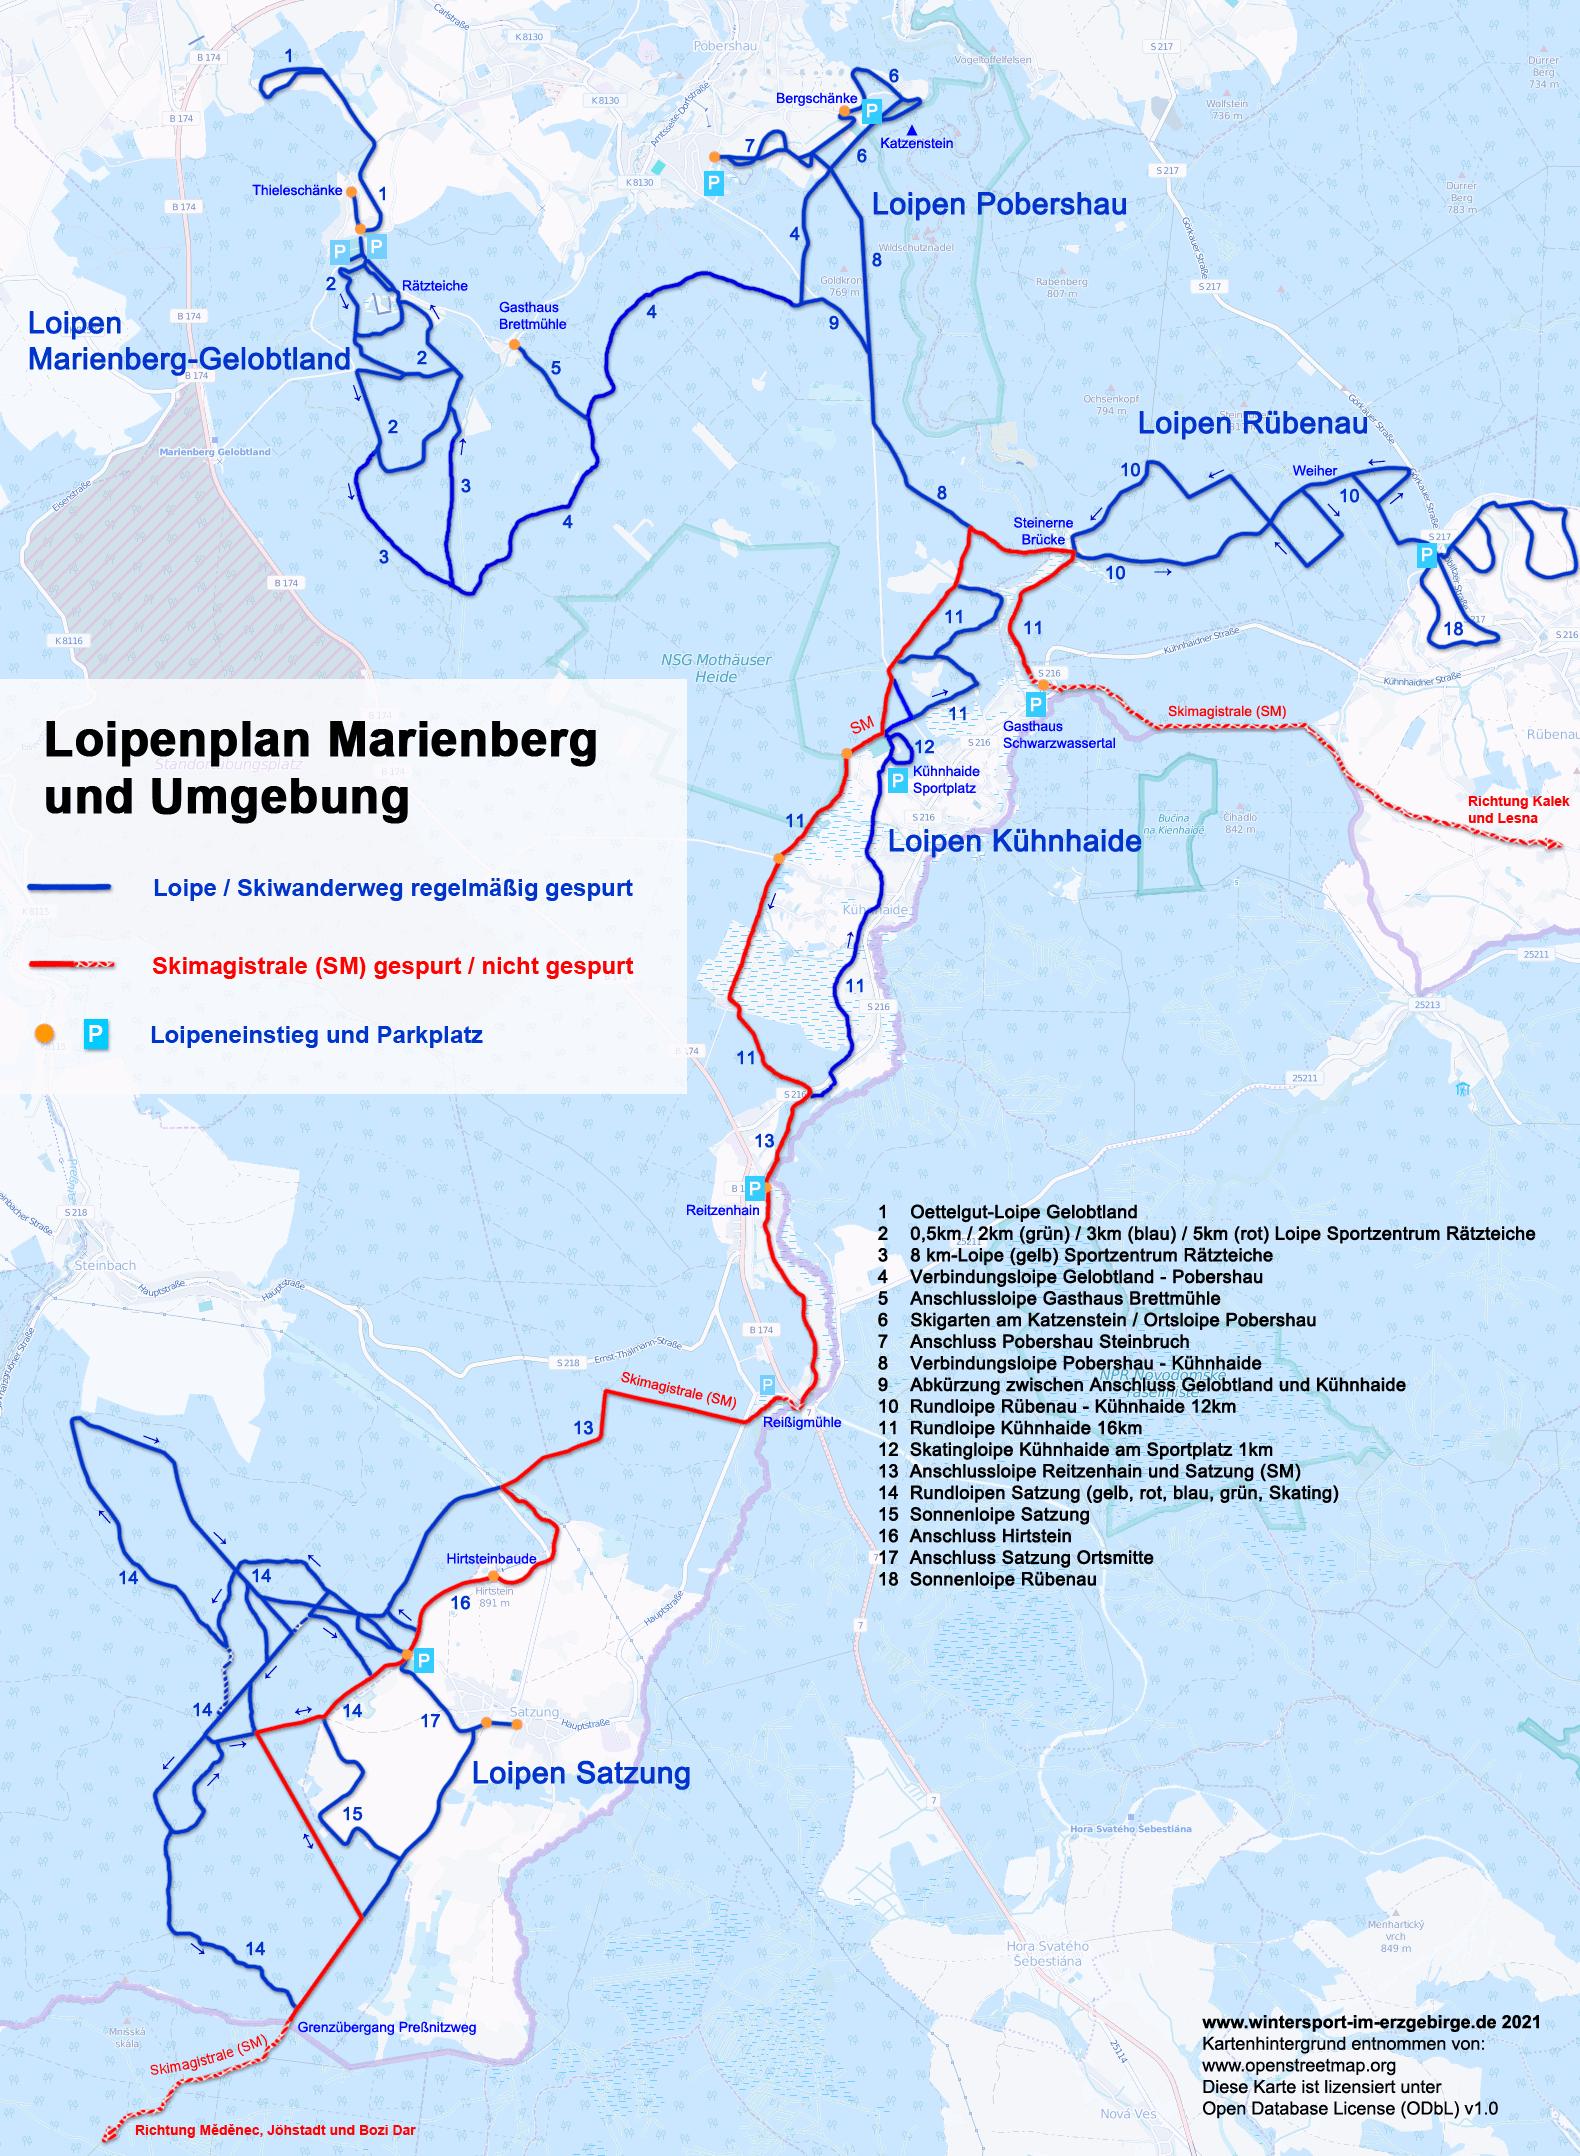 Loipenplan Marienberg mit Gelobtland, Pobershau, Rübenau, Kühnhaide und Satzung